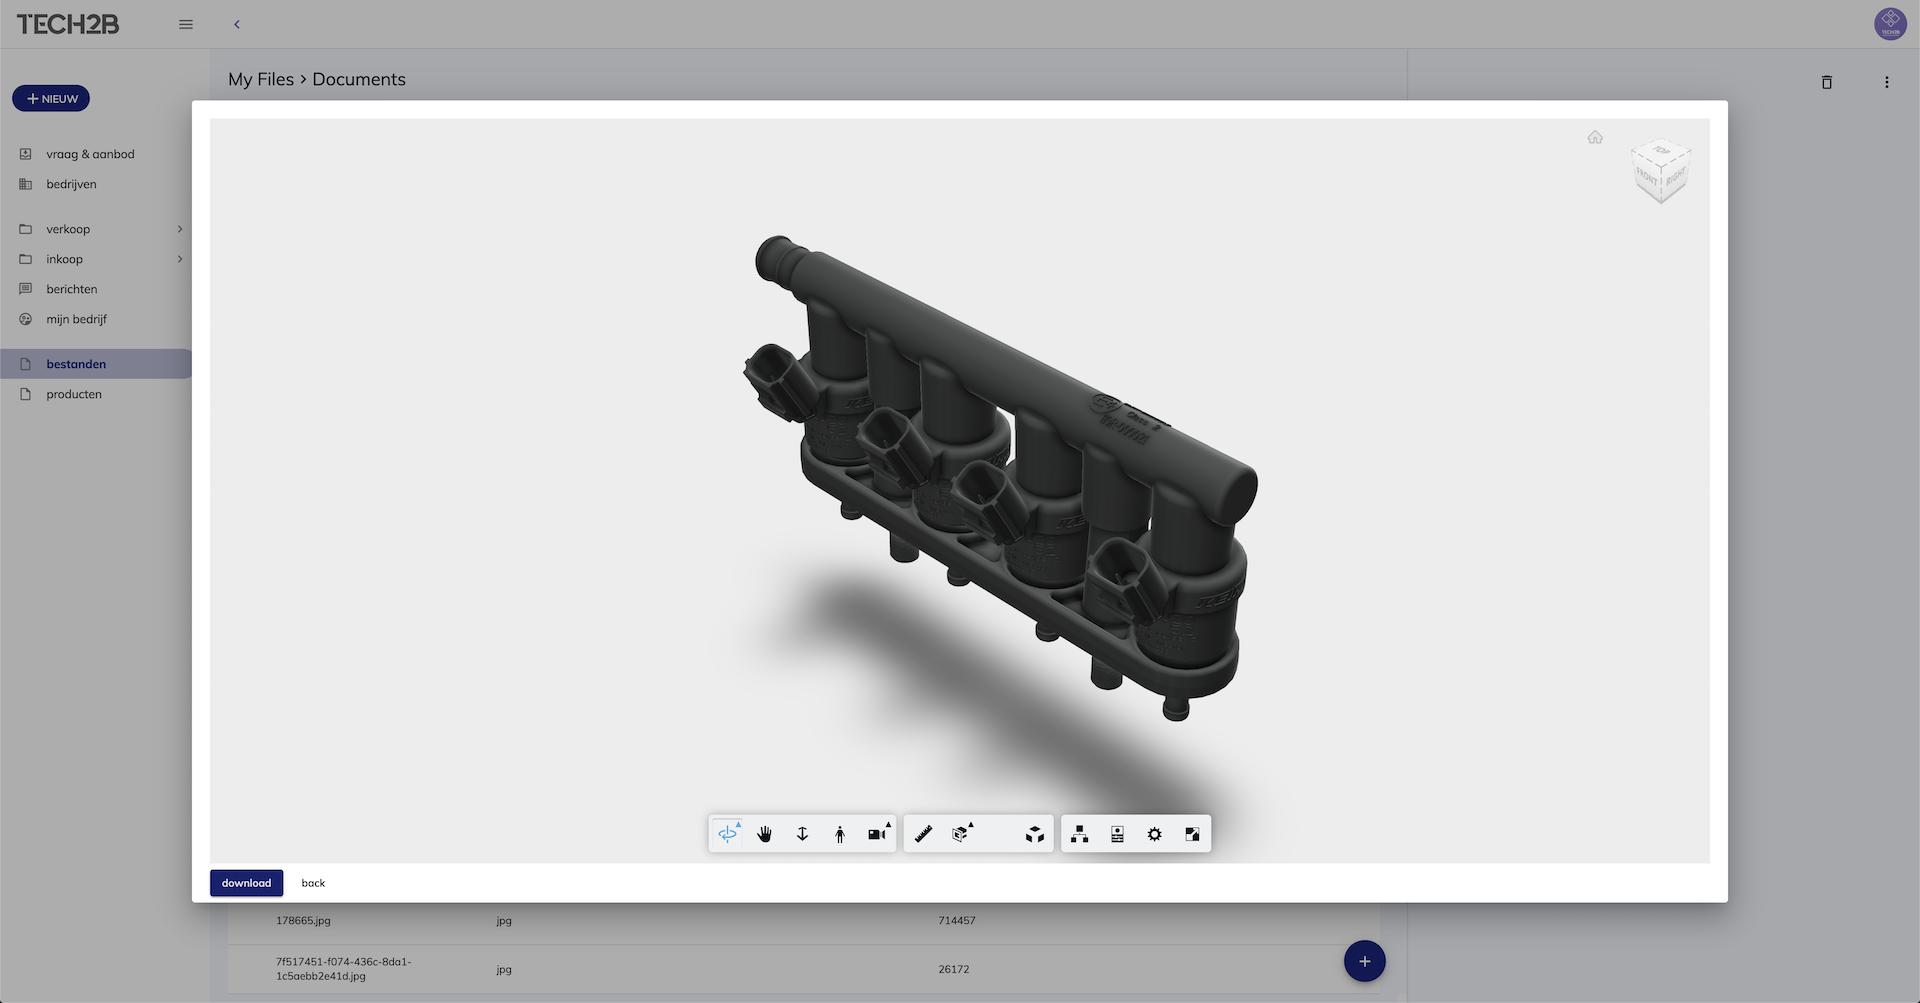 Autodesk Viewer - 3D Files - Integratie autodesk